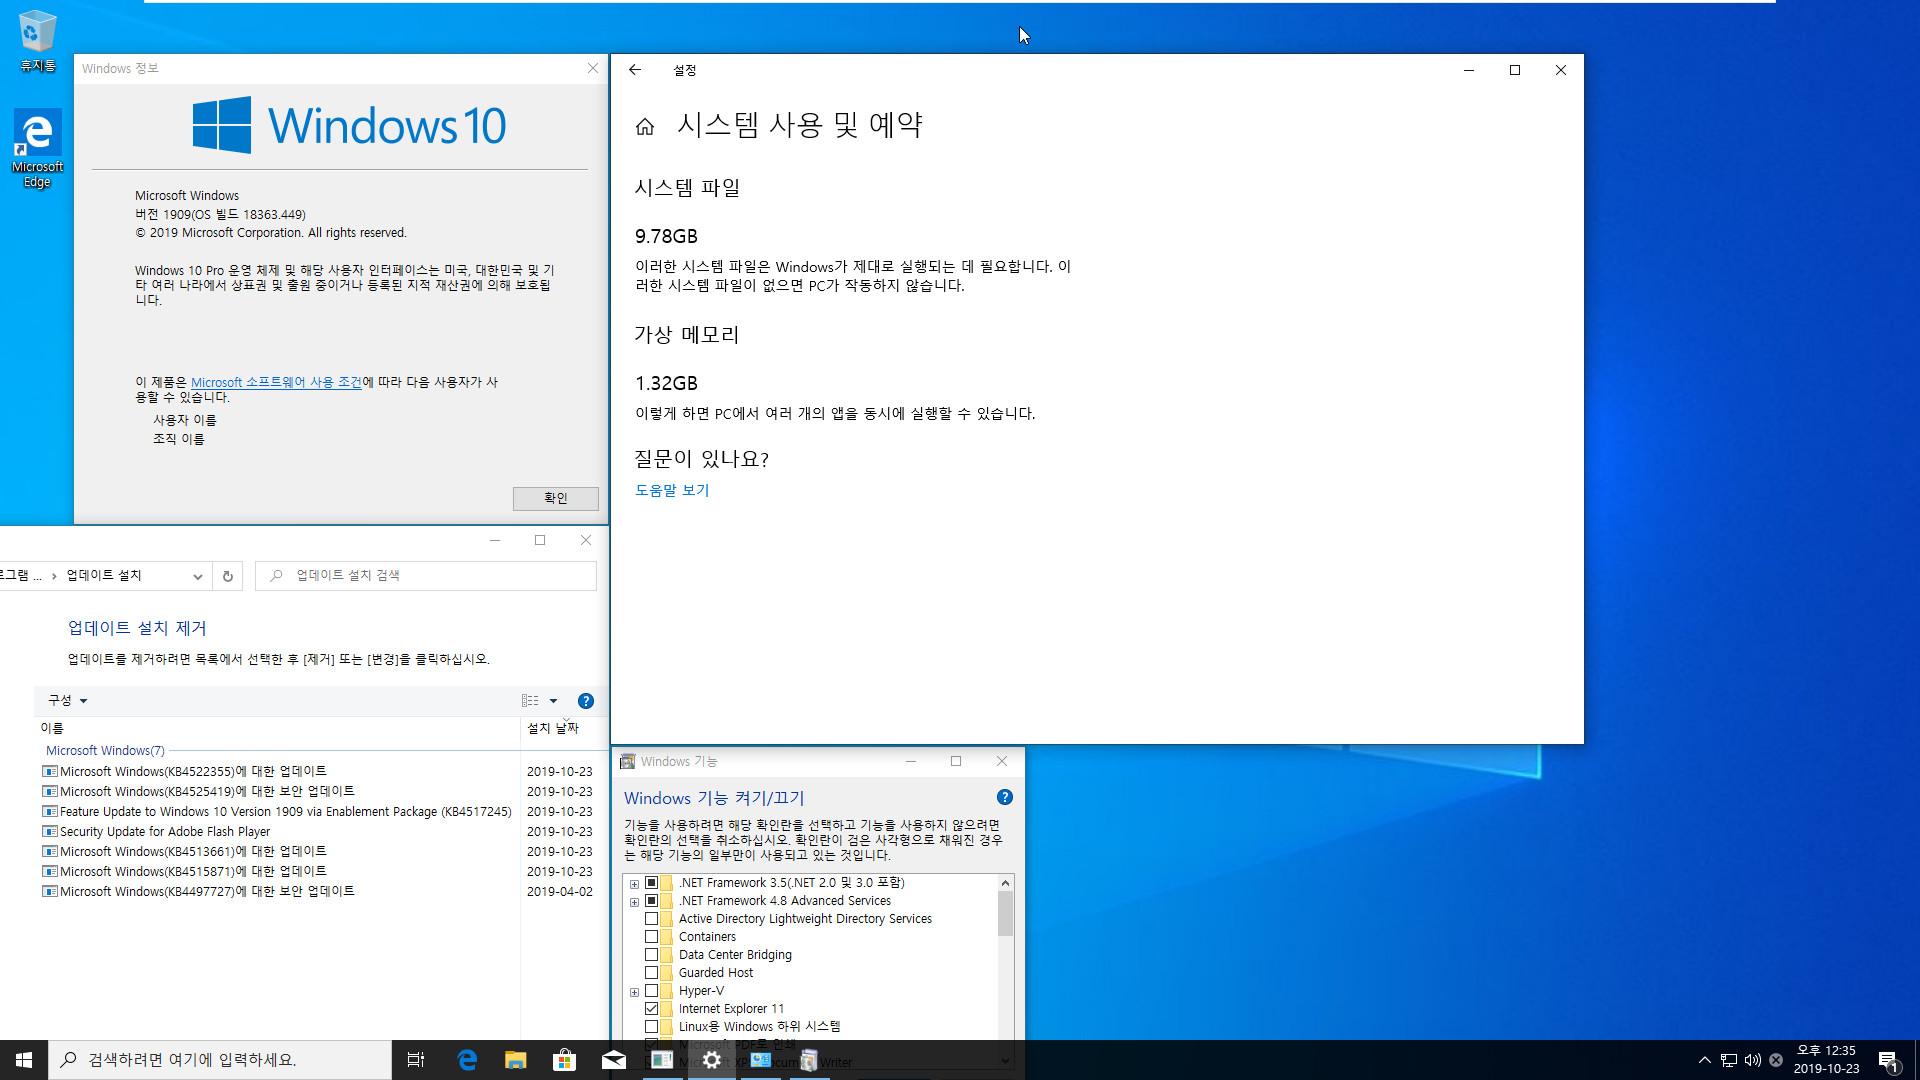 Windows 10 버전 1909 누적 업데이트 KB4522355 (OS 빌드 18363.449) [2019-10-22 일자] [릴리스 프리뷰] 나왔네요 - 19H2와 19H1을 함께 프로 64비트 install.wim 통합합니다. [최초기록, 예약된 저장소 삭제 적용] 2019-10-23_123519.jpg